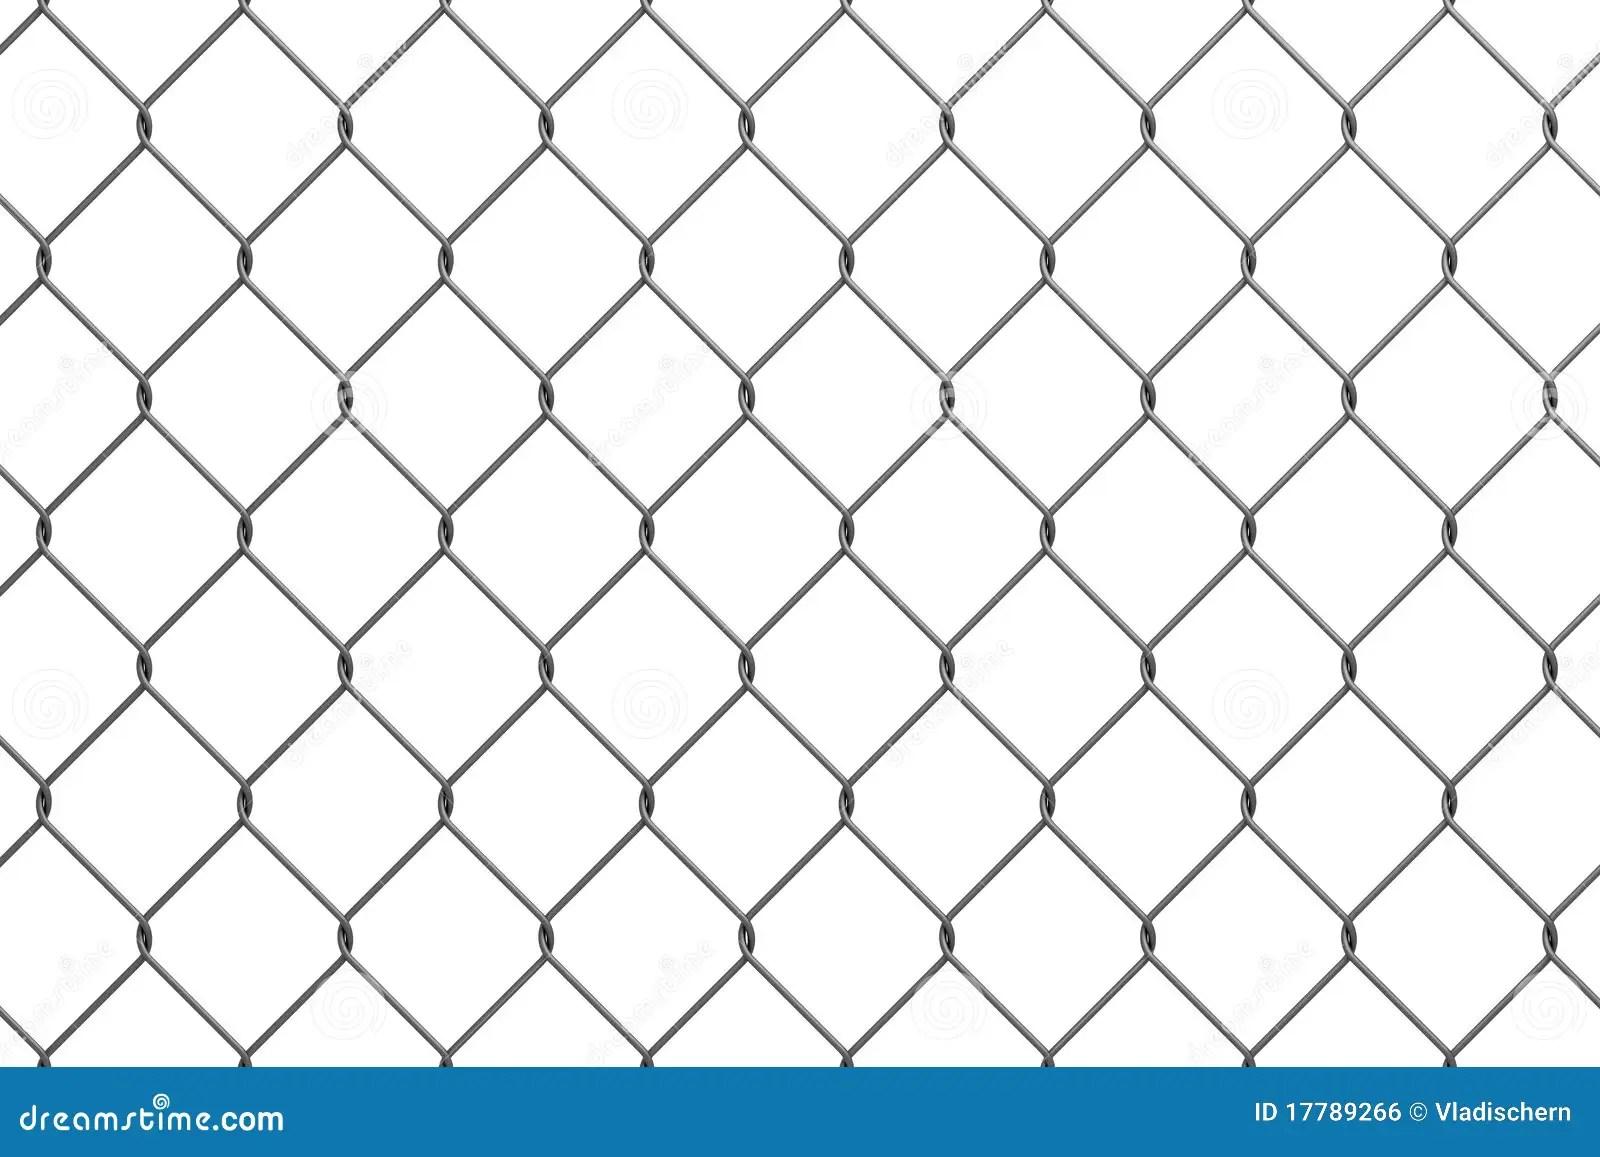 Iron Wire Fence Stock Illustration Image Of Metallic